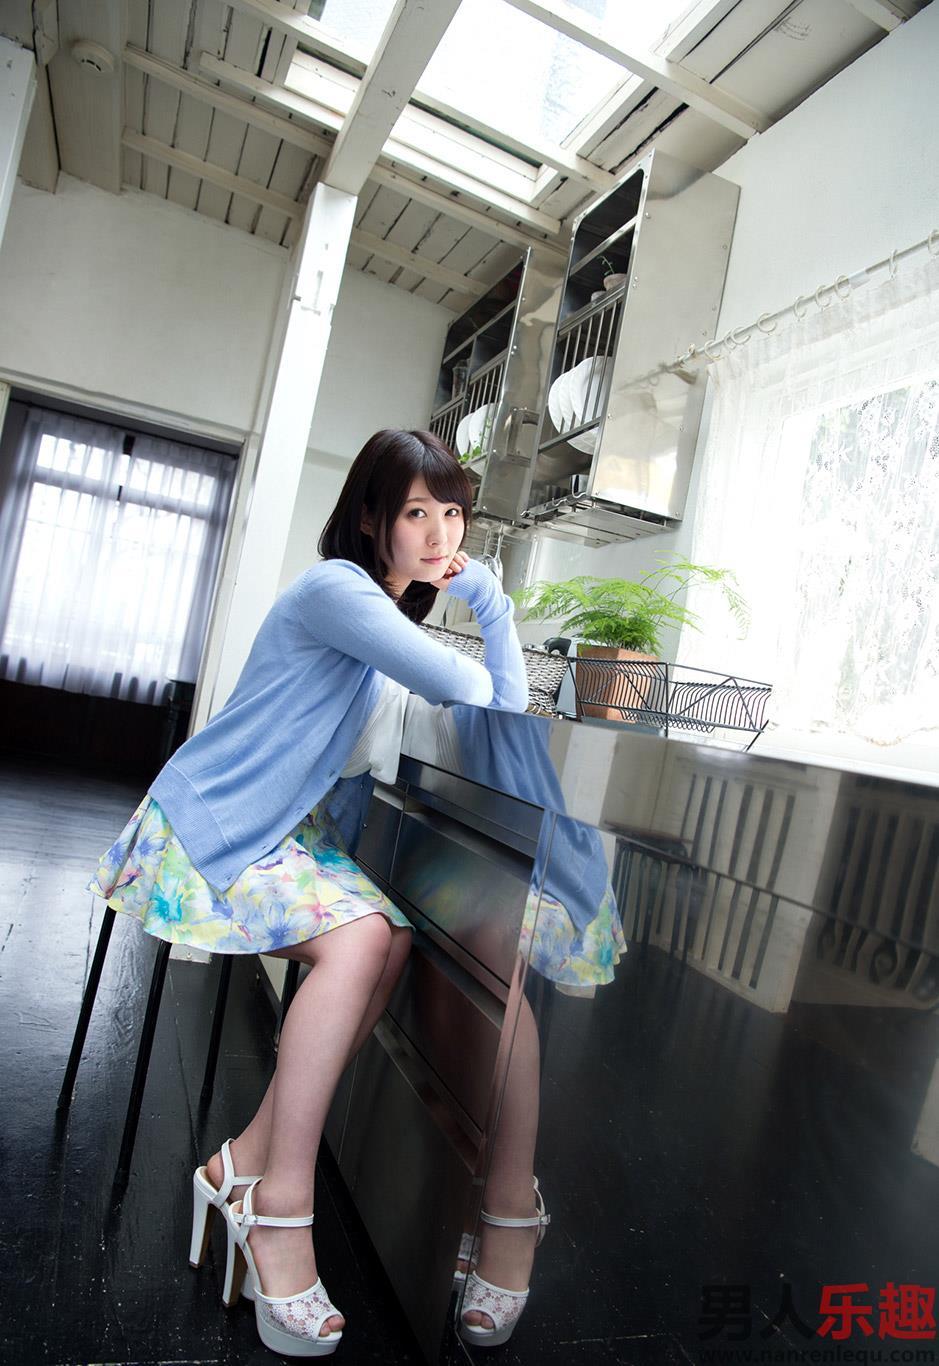 Hot Japanese AV Girls Rin Asuka 飛鳥りん Sexy Photos Gallery